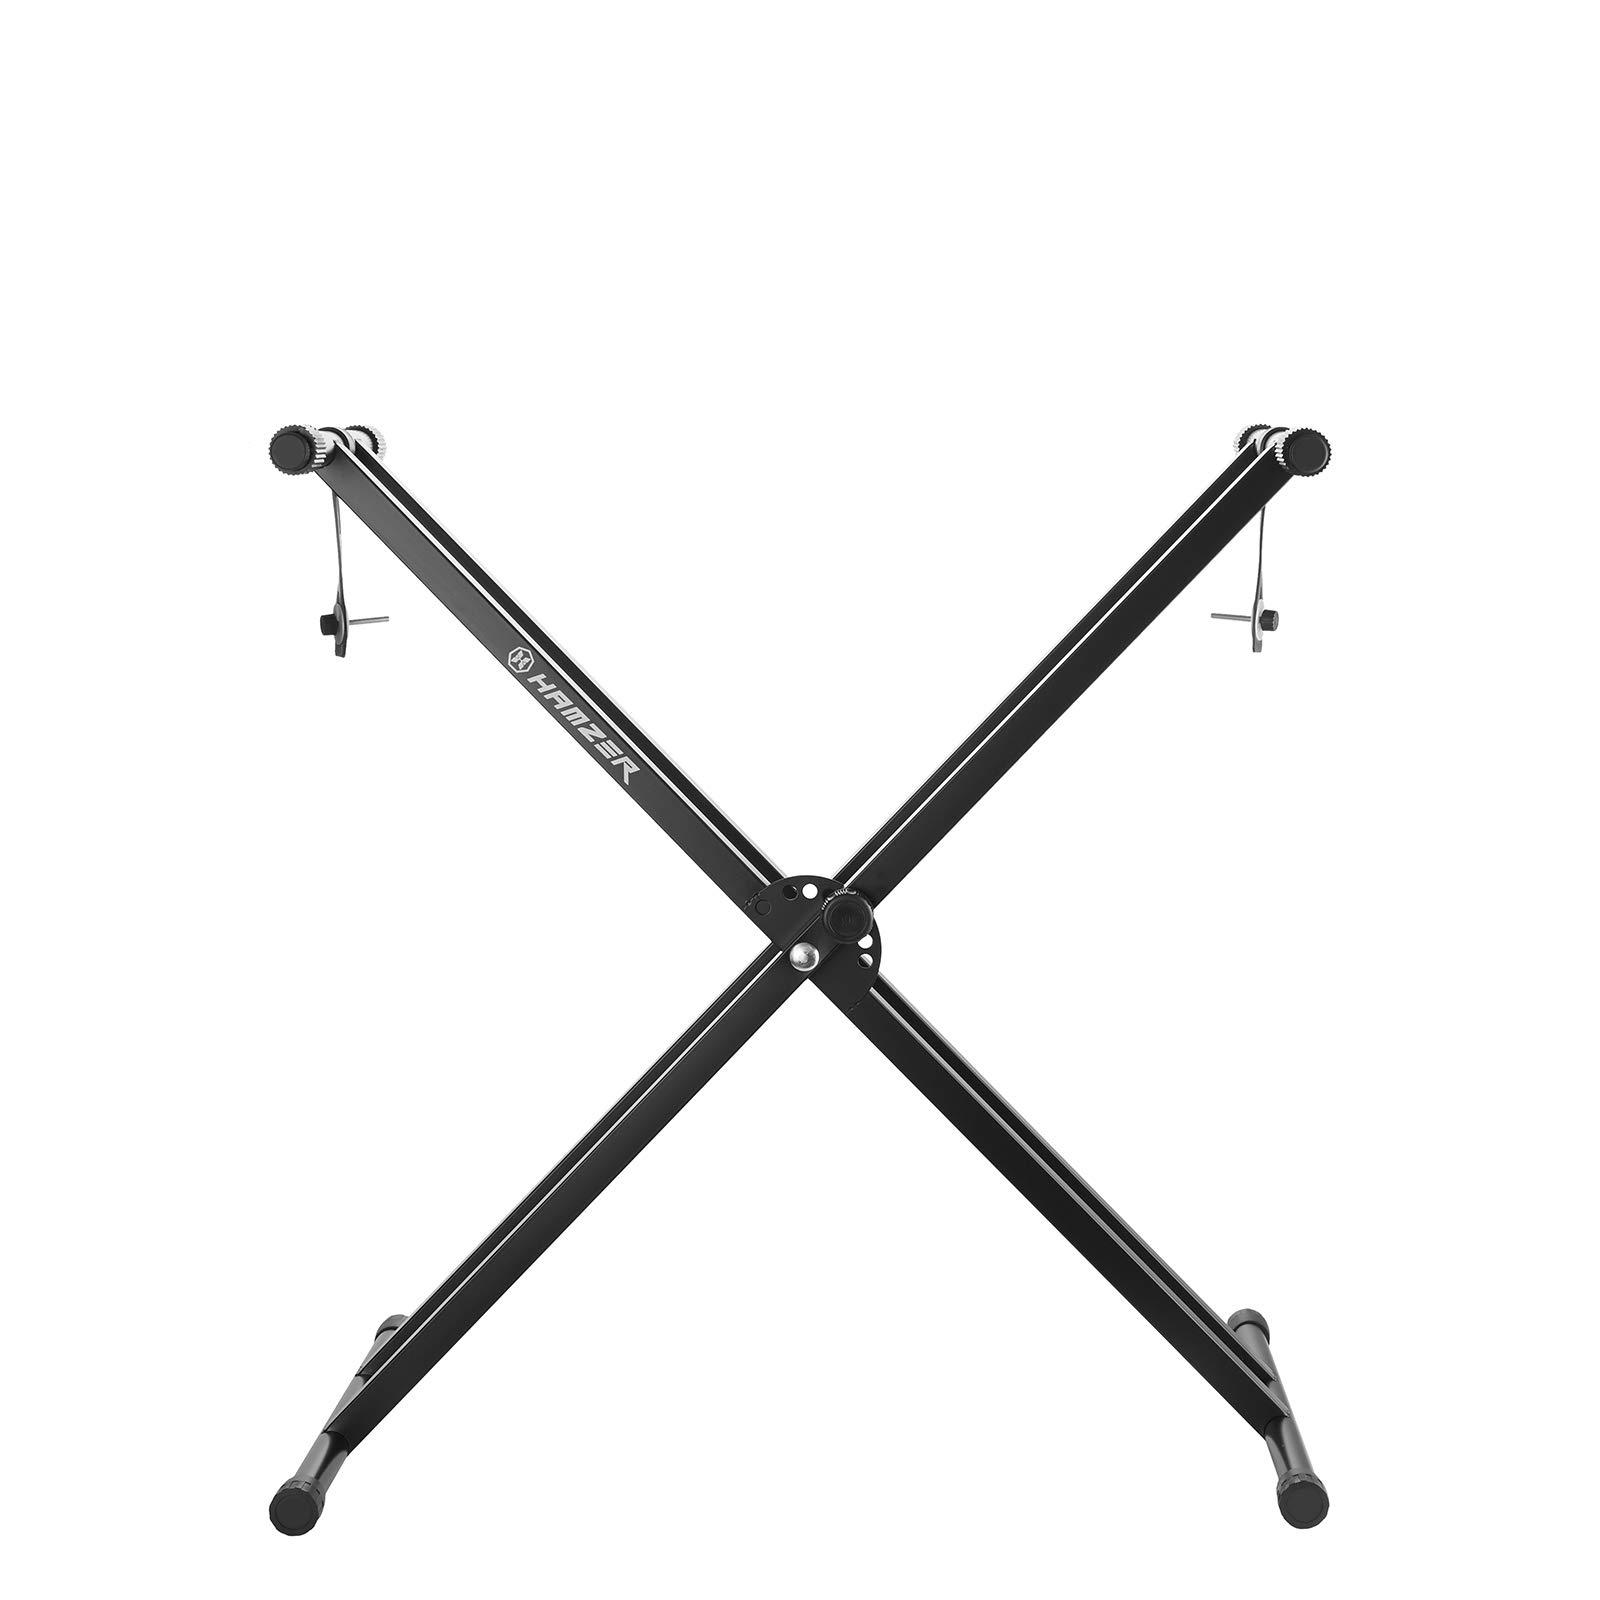 Hamzer Premium Heavy Duty Double Braced Adjustable X2 Style Music Piano Keyboard Stand by Hamzer (Image #3)